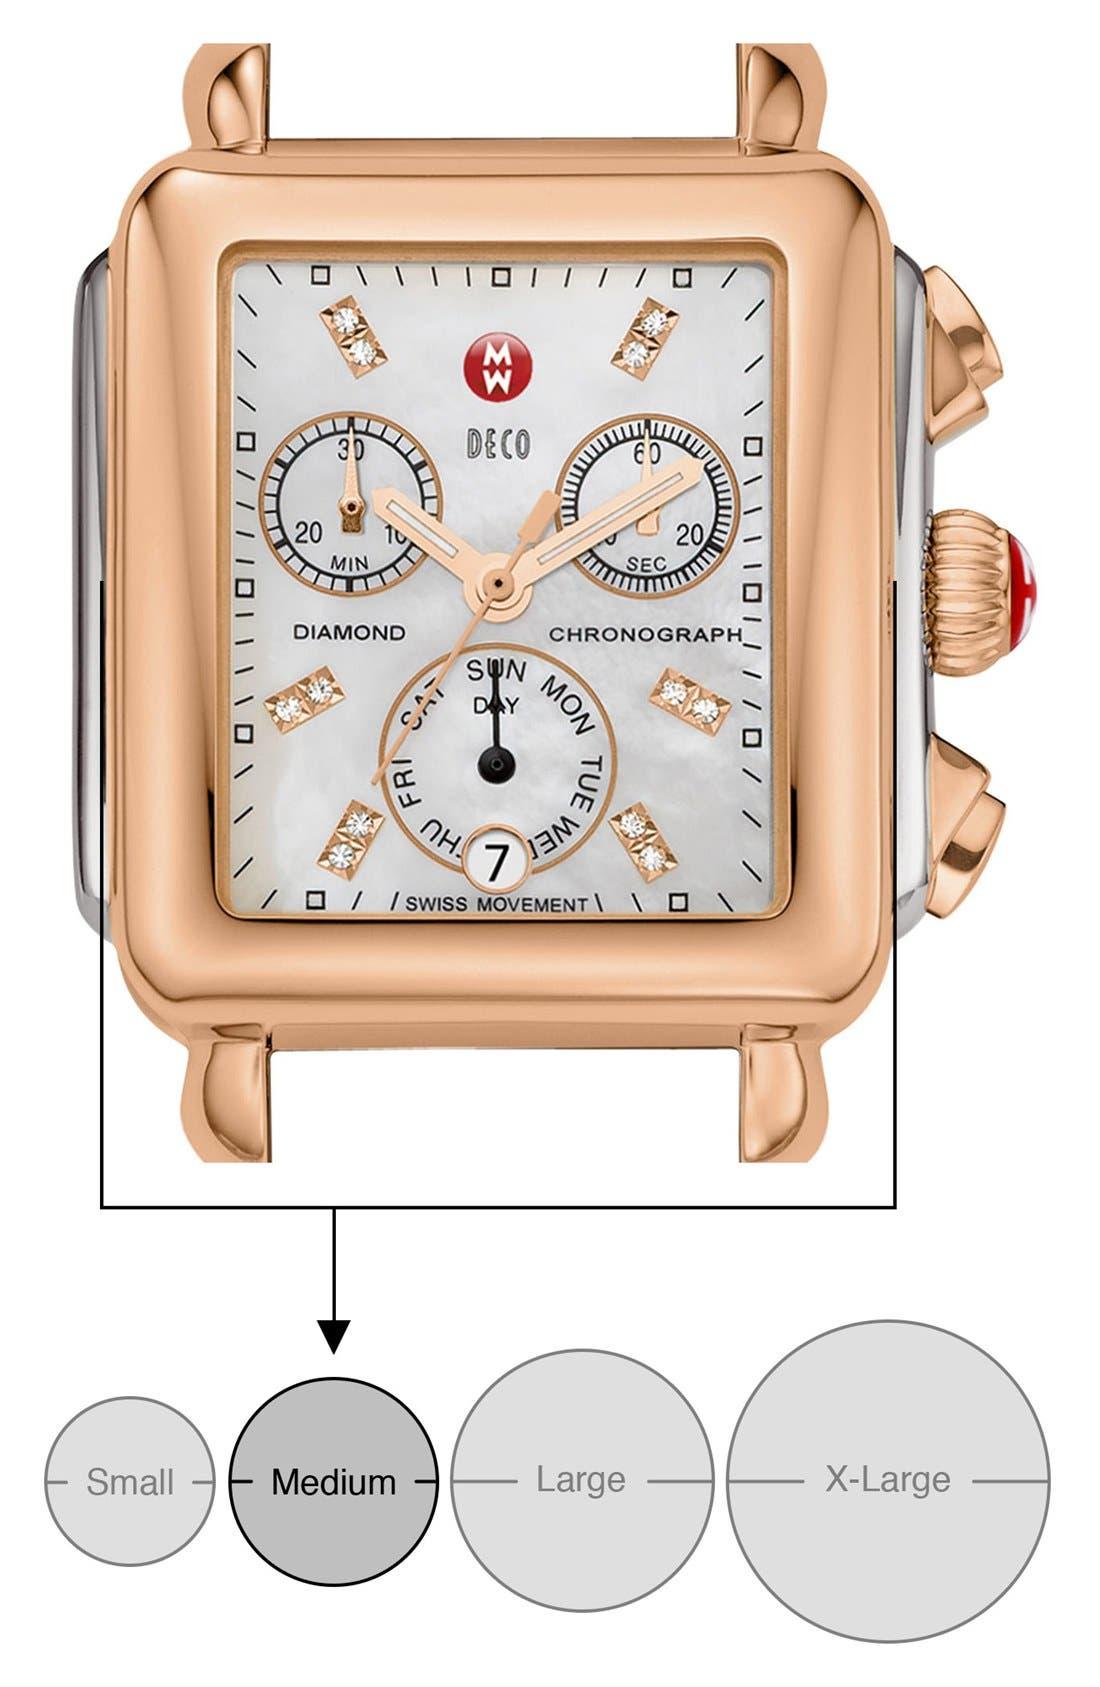 Deco Diamond Diamond Dial Watch Case, 33mm x 35mm,                             Alternate thumbnail 6, color,                             SILVER/ BLACK